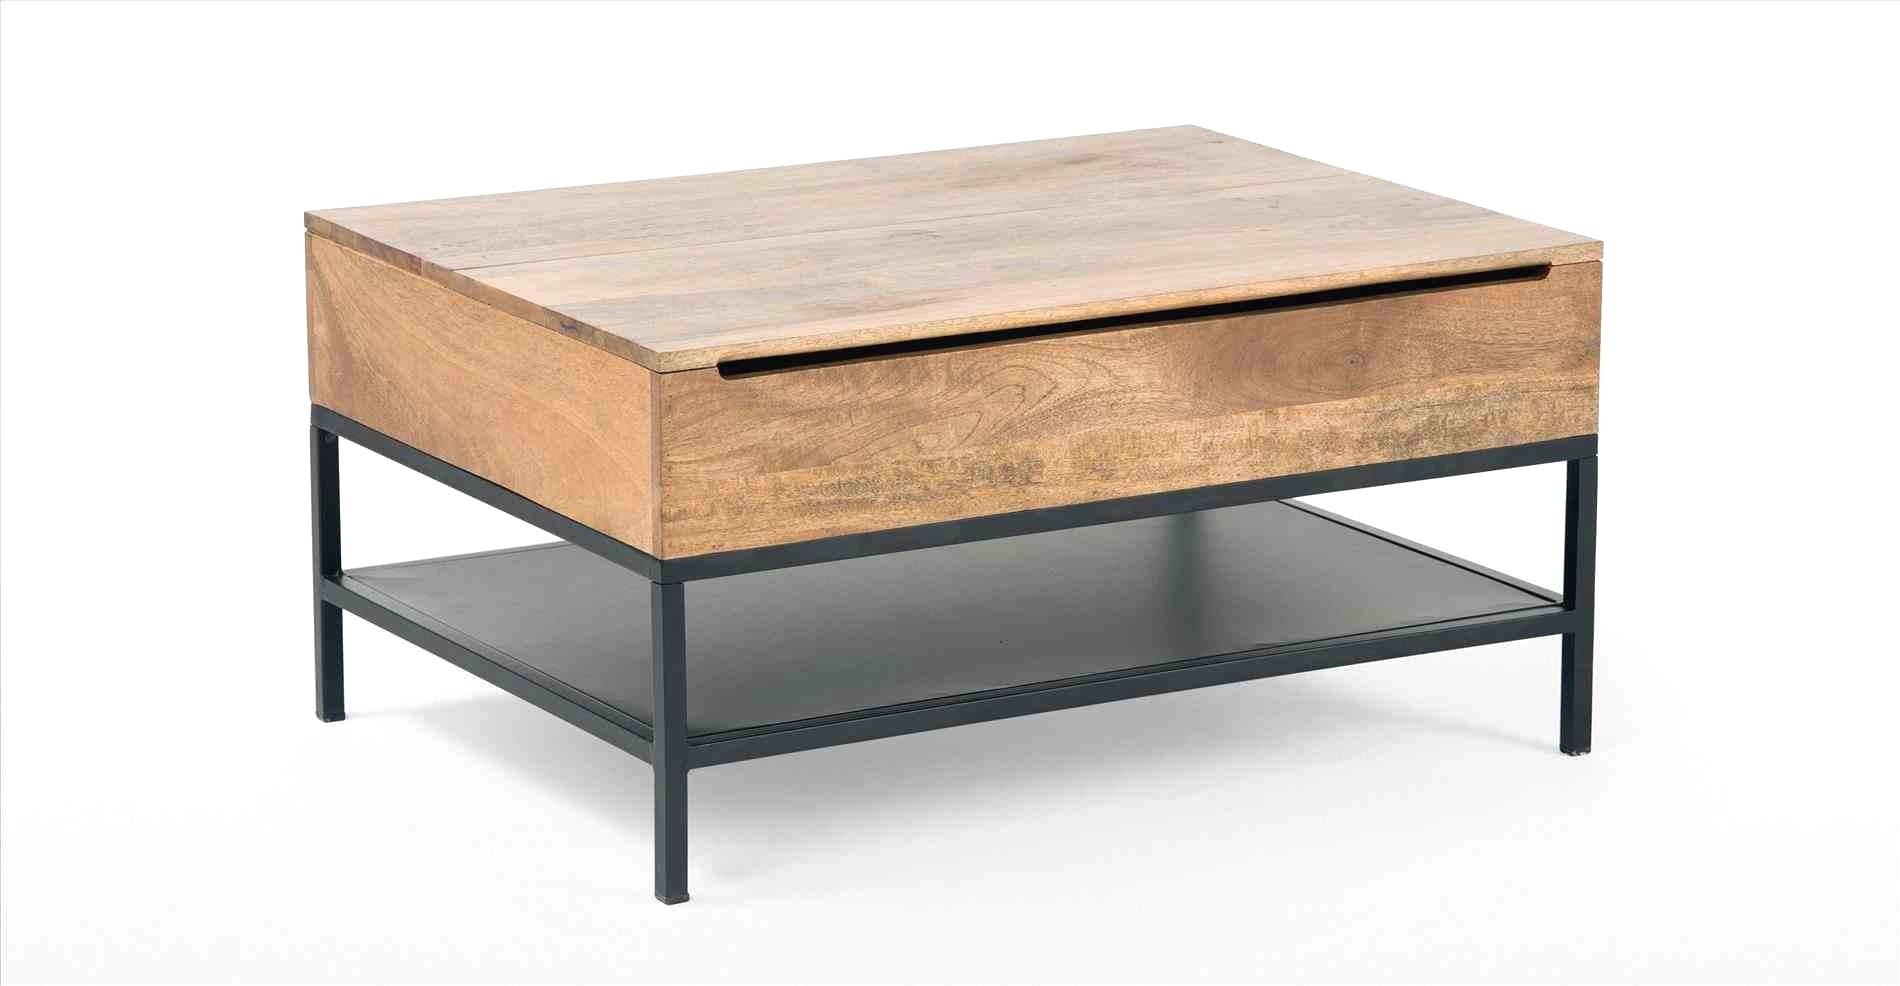 Table basse scandinave siwa